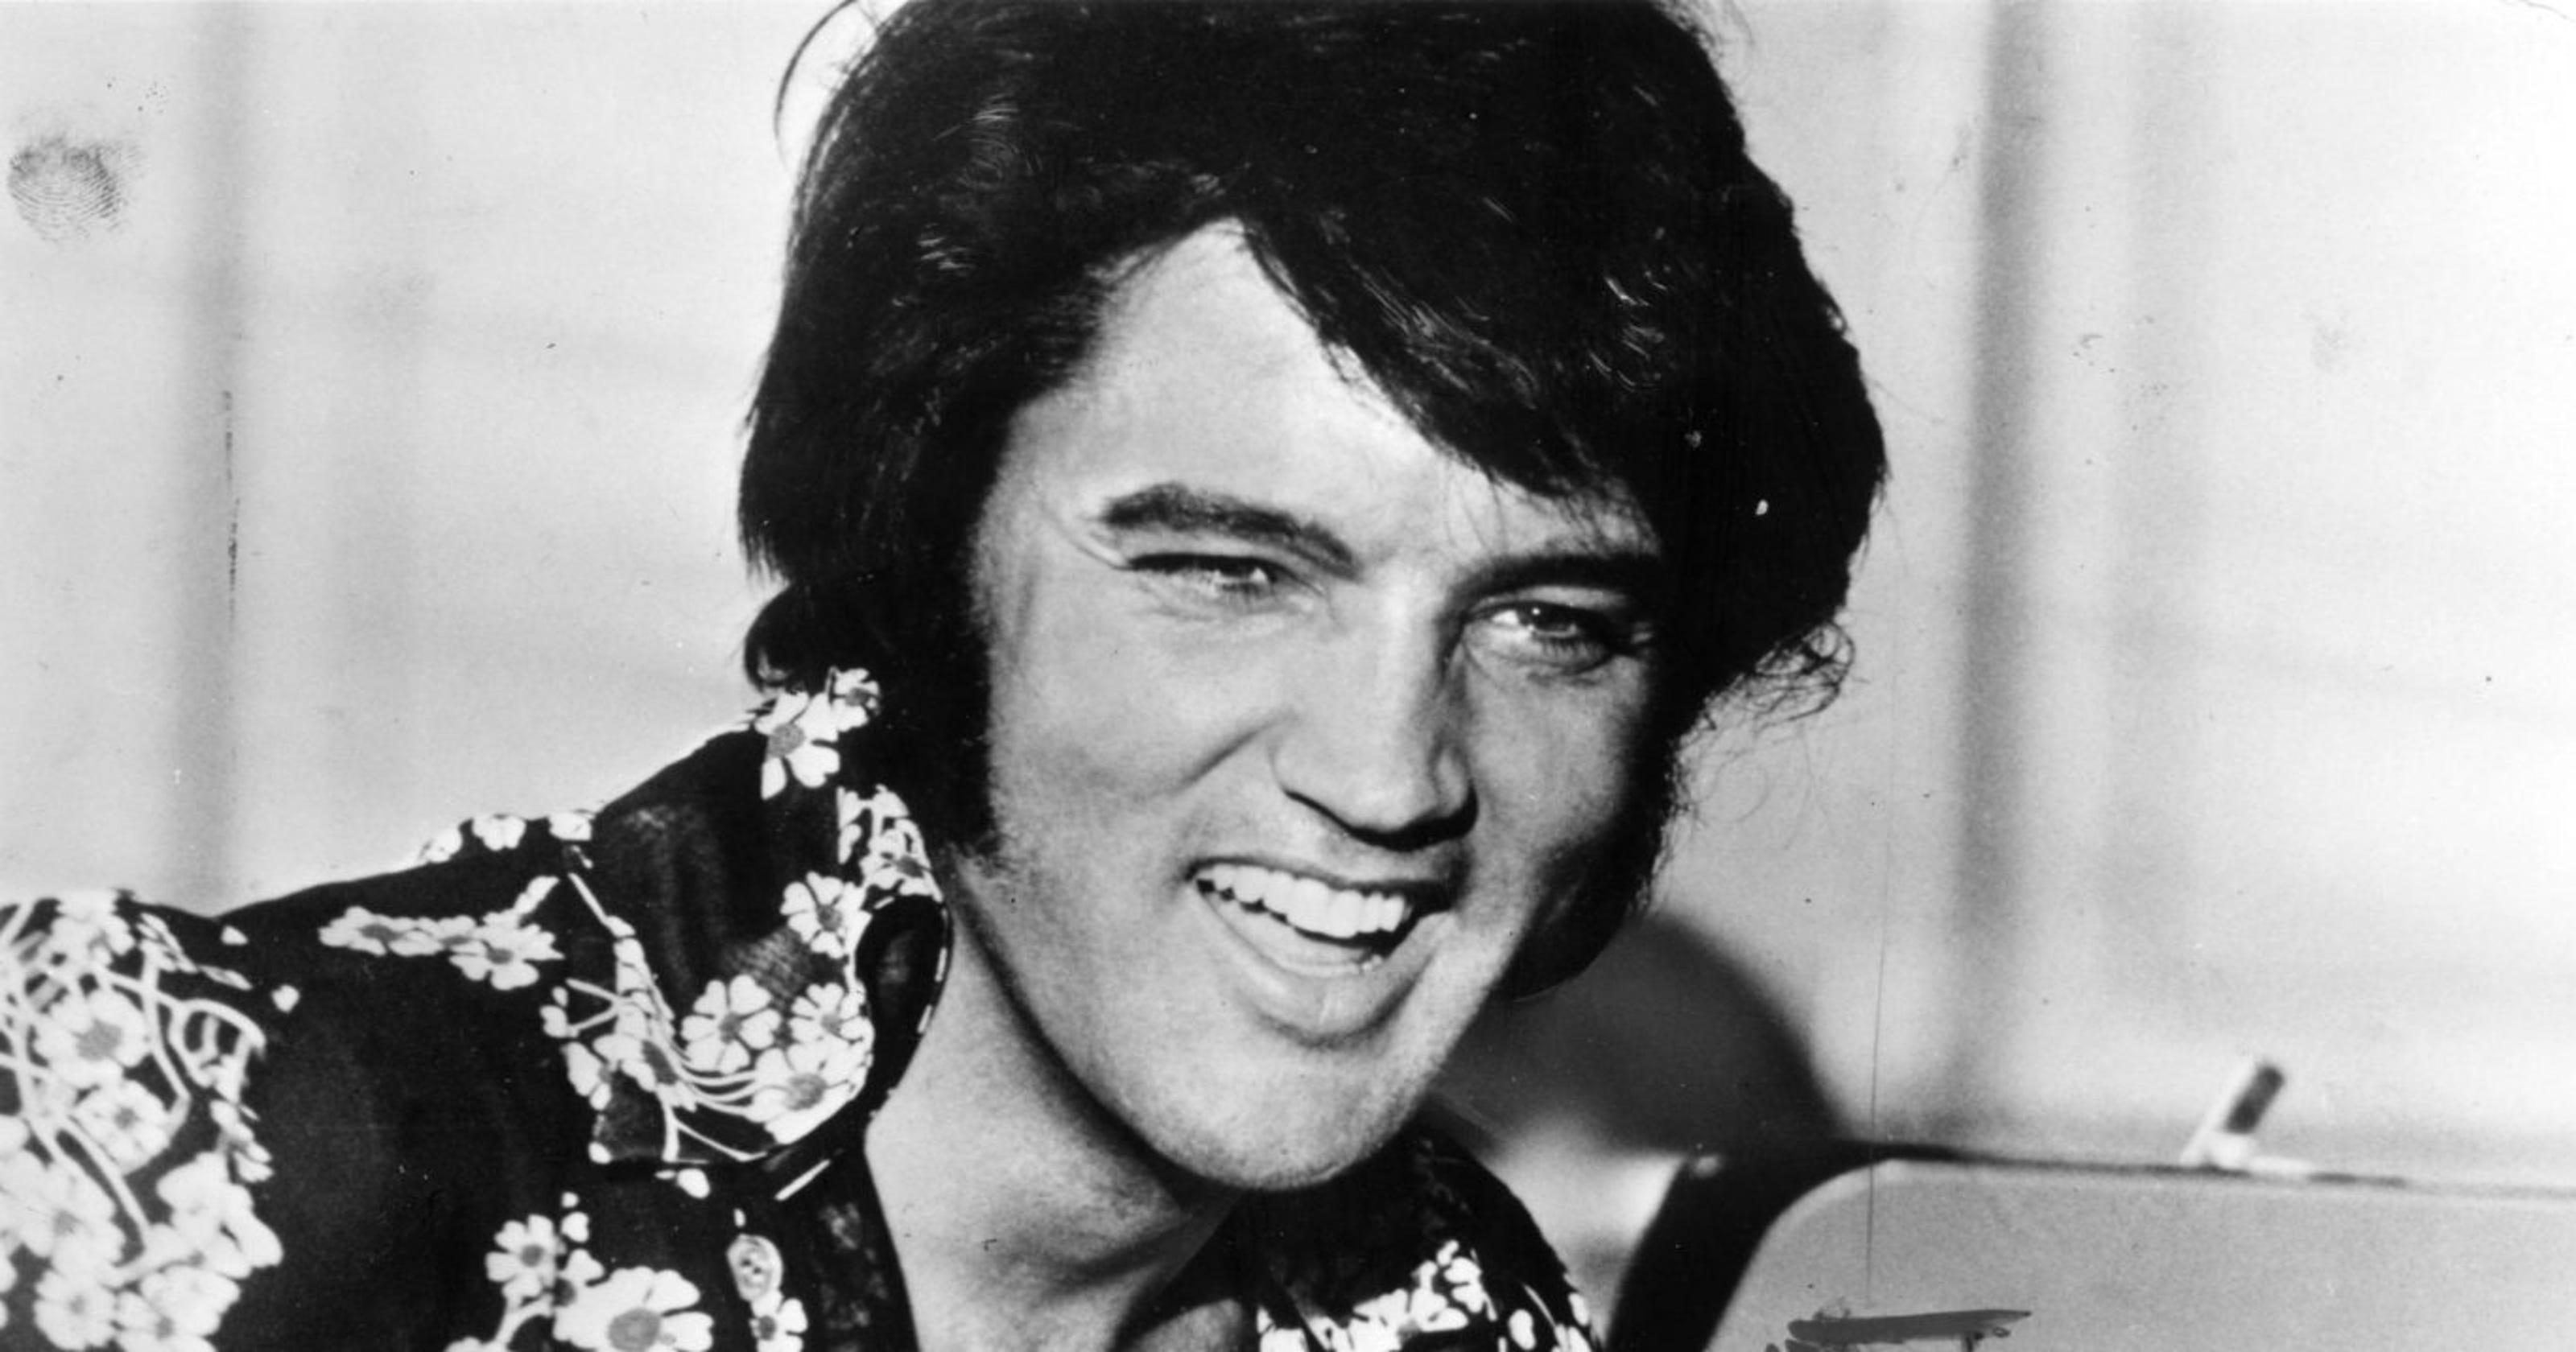 Hasil gambar untuk Donald Trump honors Elvis Presley, Babe Ruth in first Medal of Freedom ceremony